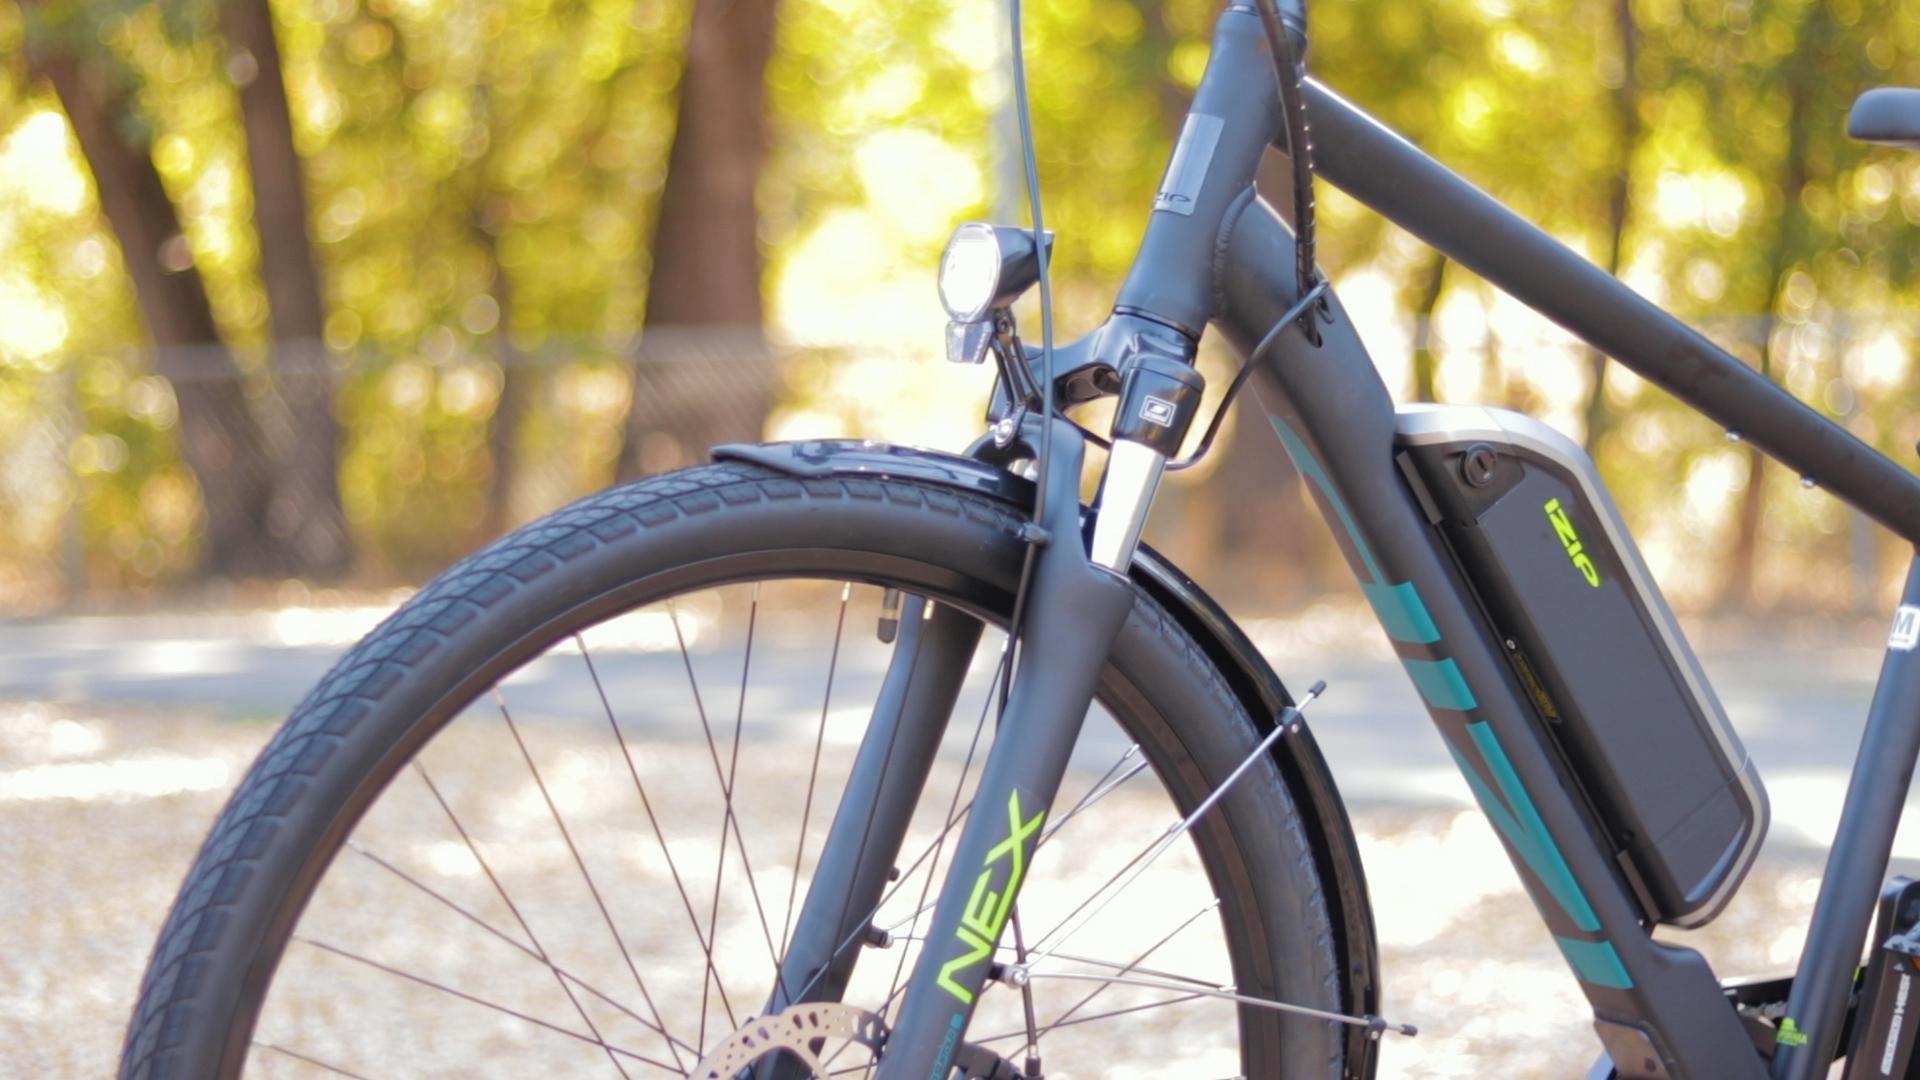 electrified-reviews-izip-e3-brio-electric-bike-review-suntour-nex-suspension.jpg